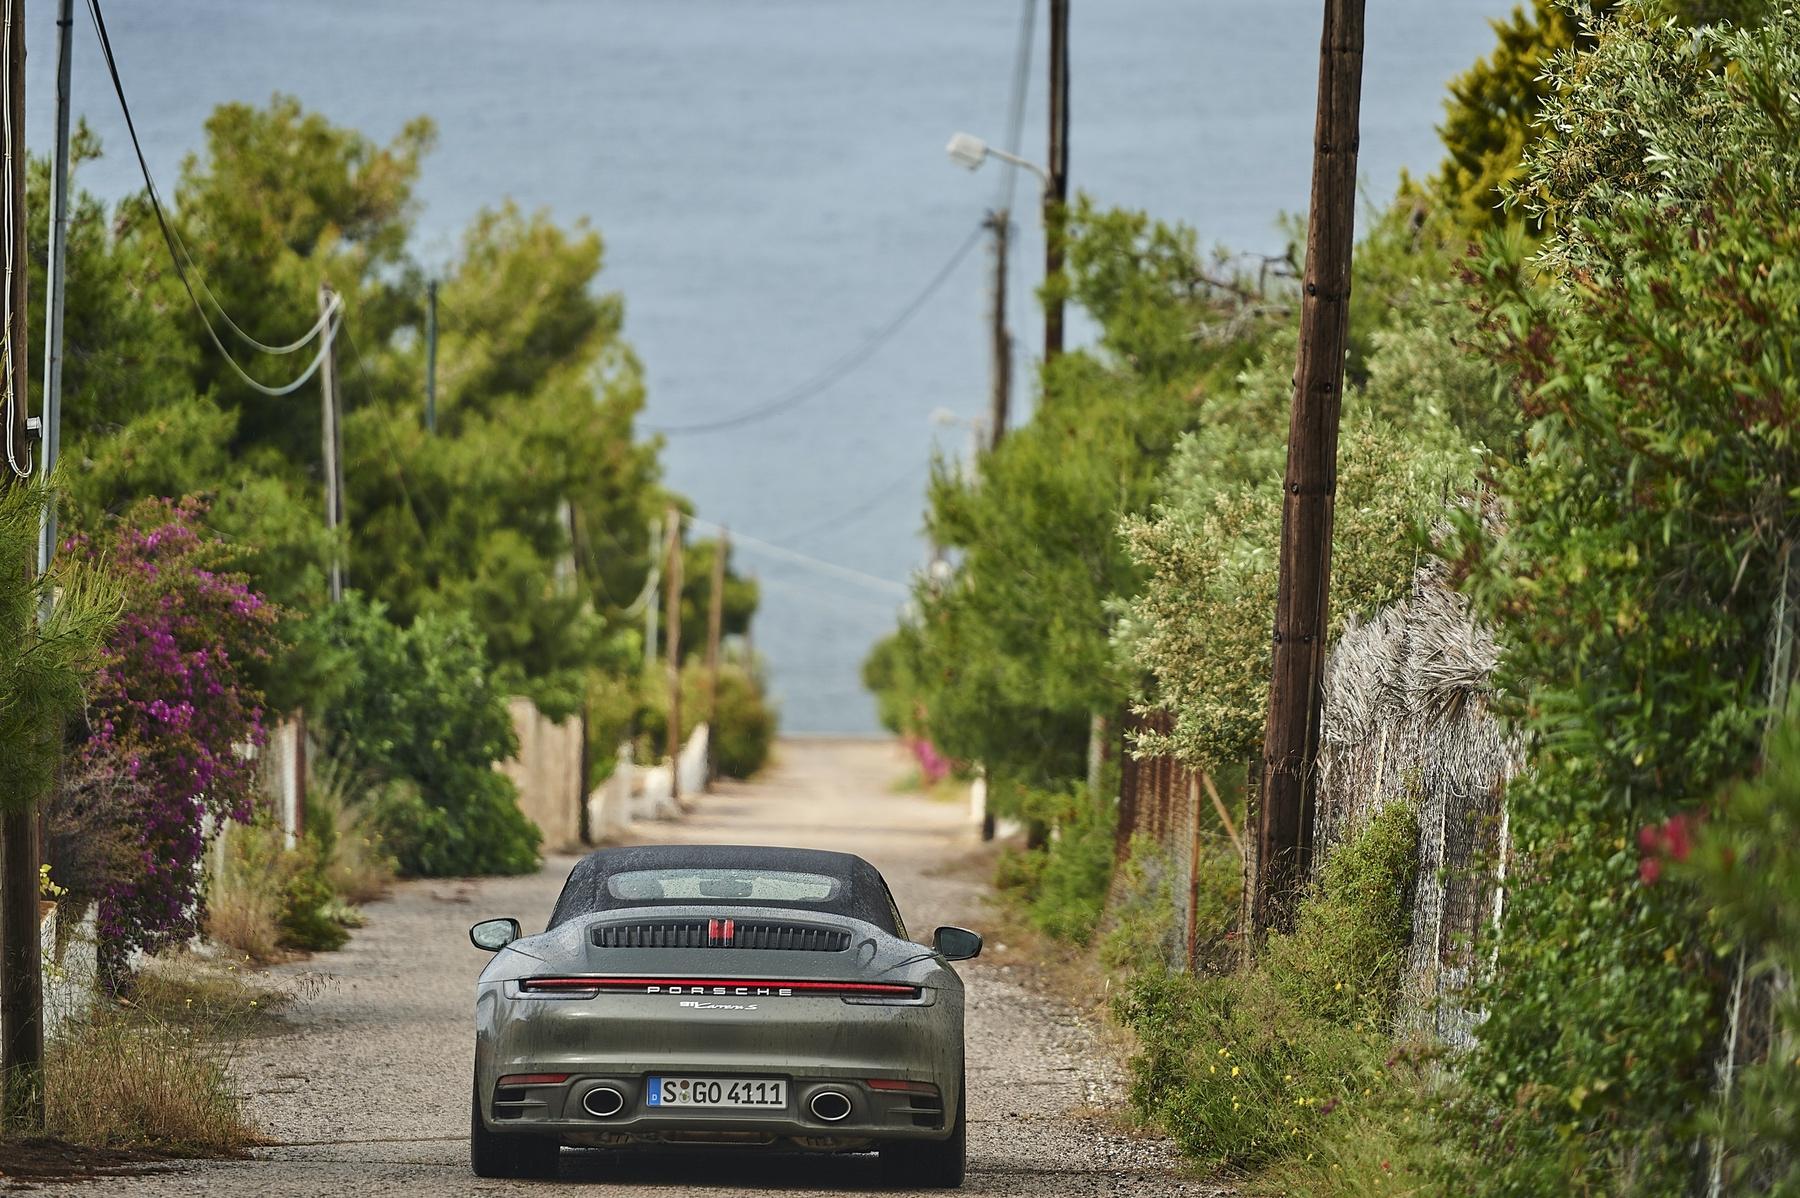 Test_Drive_Porsche_911_Athens_0032